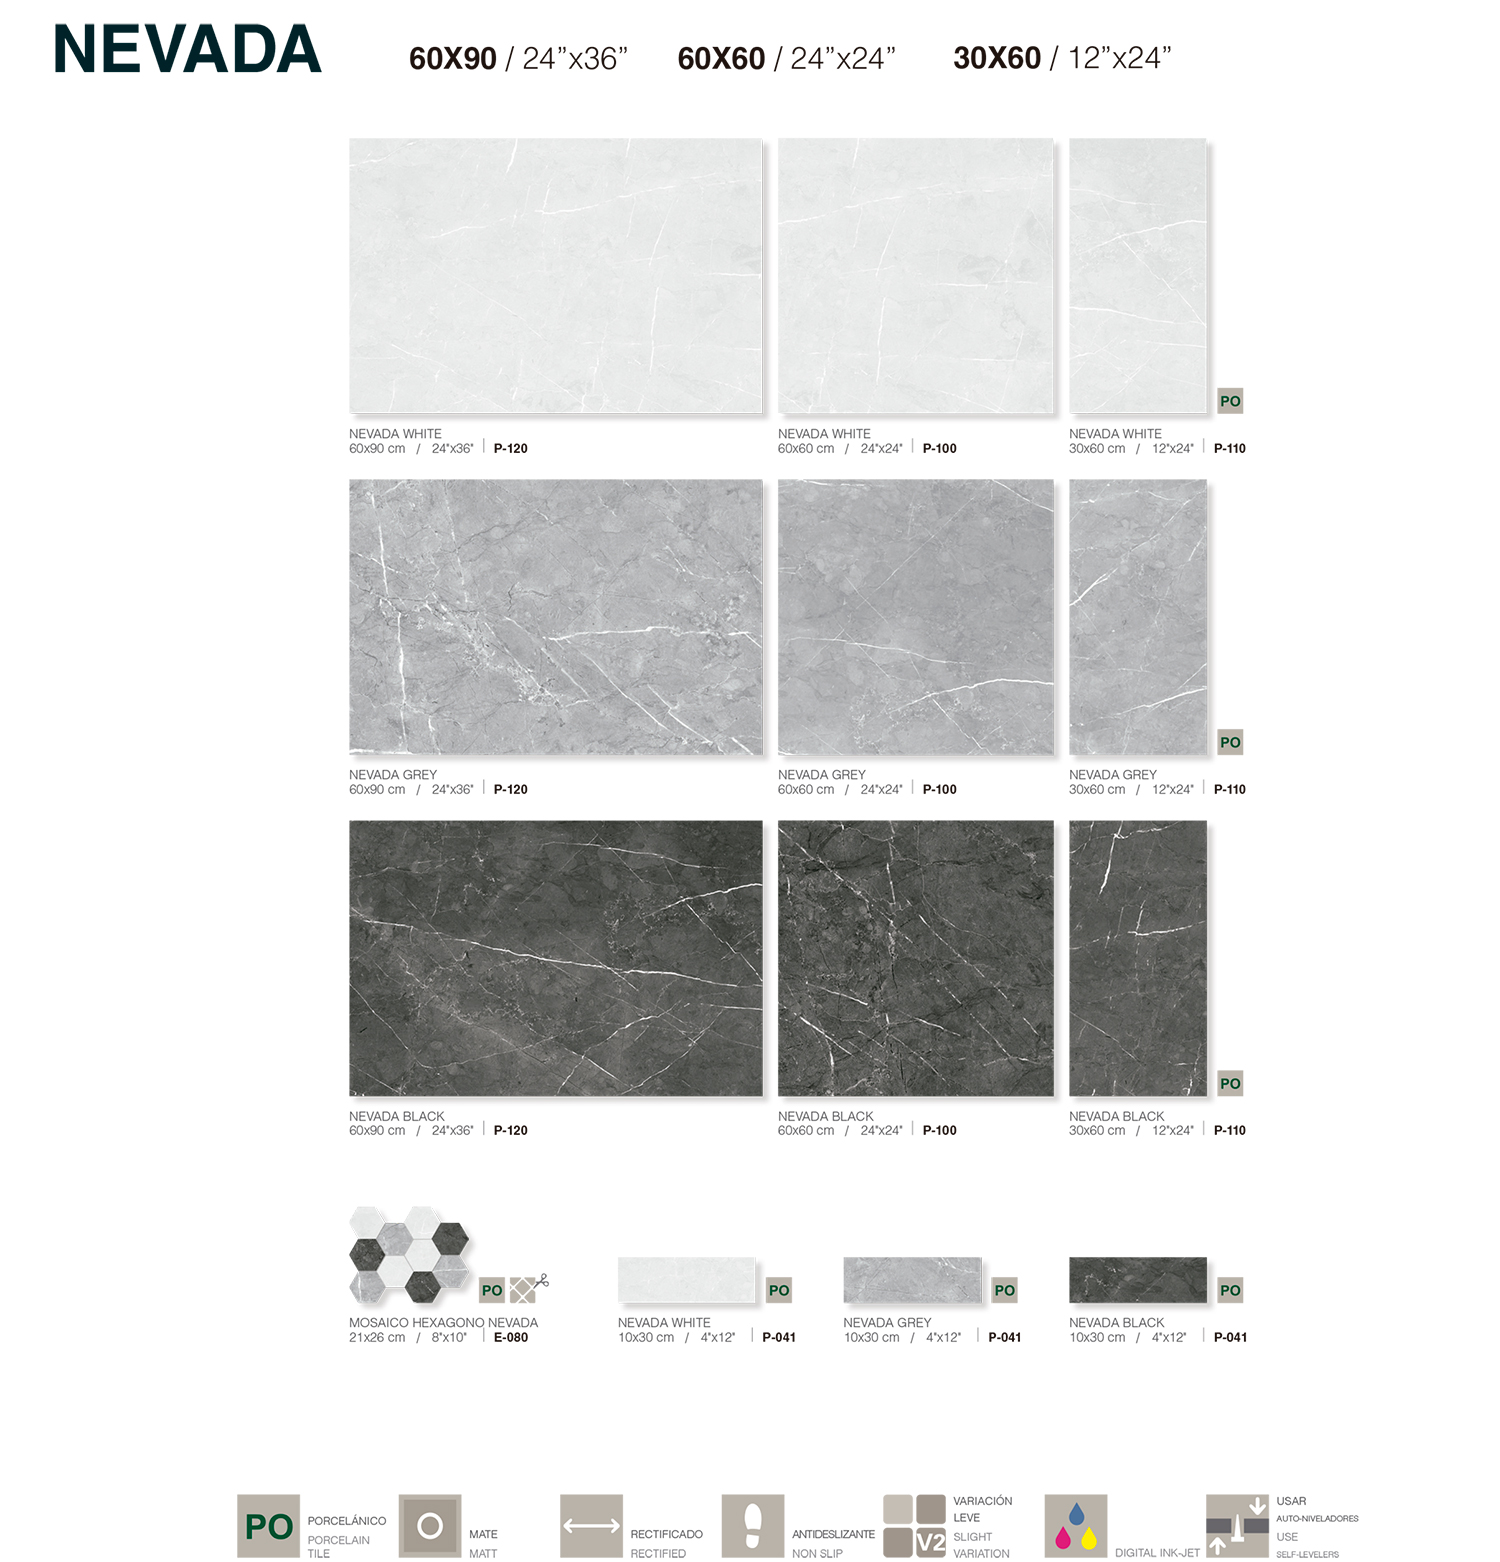 NEVADA-2